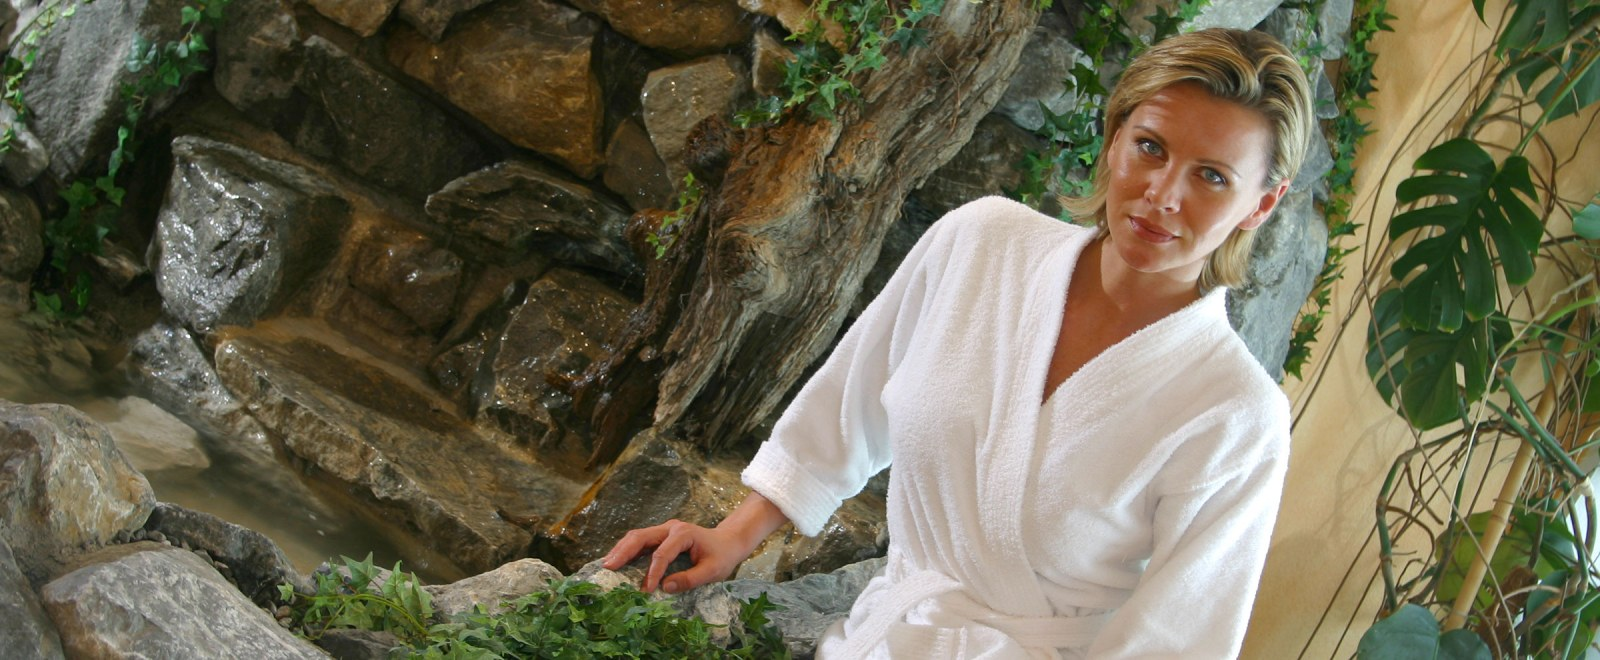 Frau im Wellnessurlaub im Allgäu